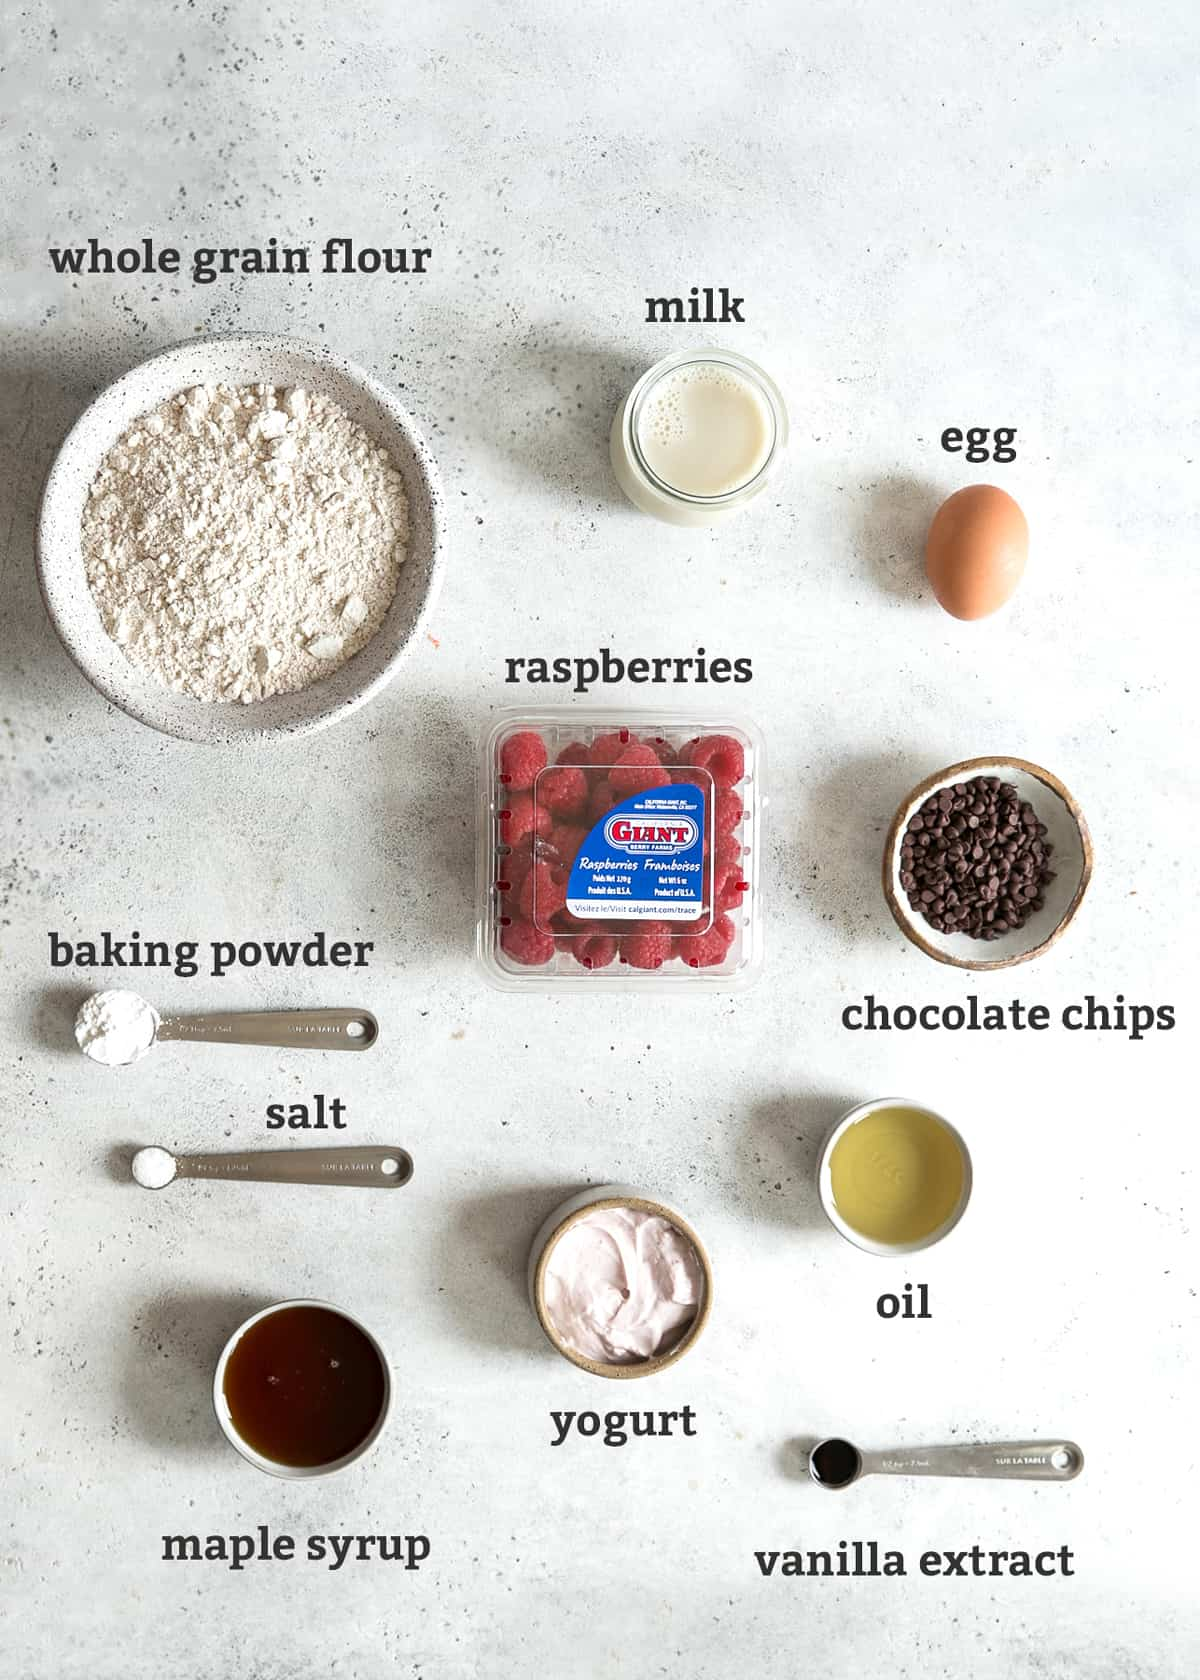 ingredients labeled on board; whole grain flour, milk, egg, raspberries, baking powder, salt, chocolate chips, oil, yogurt, maple syrup, vanilla extract